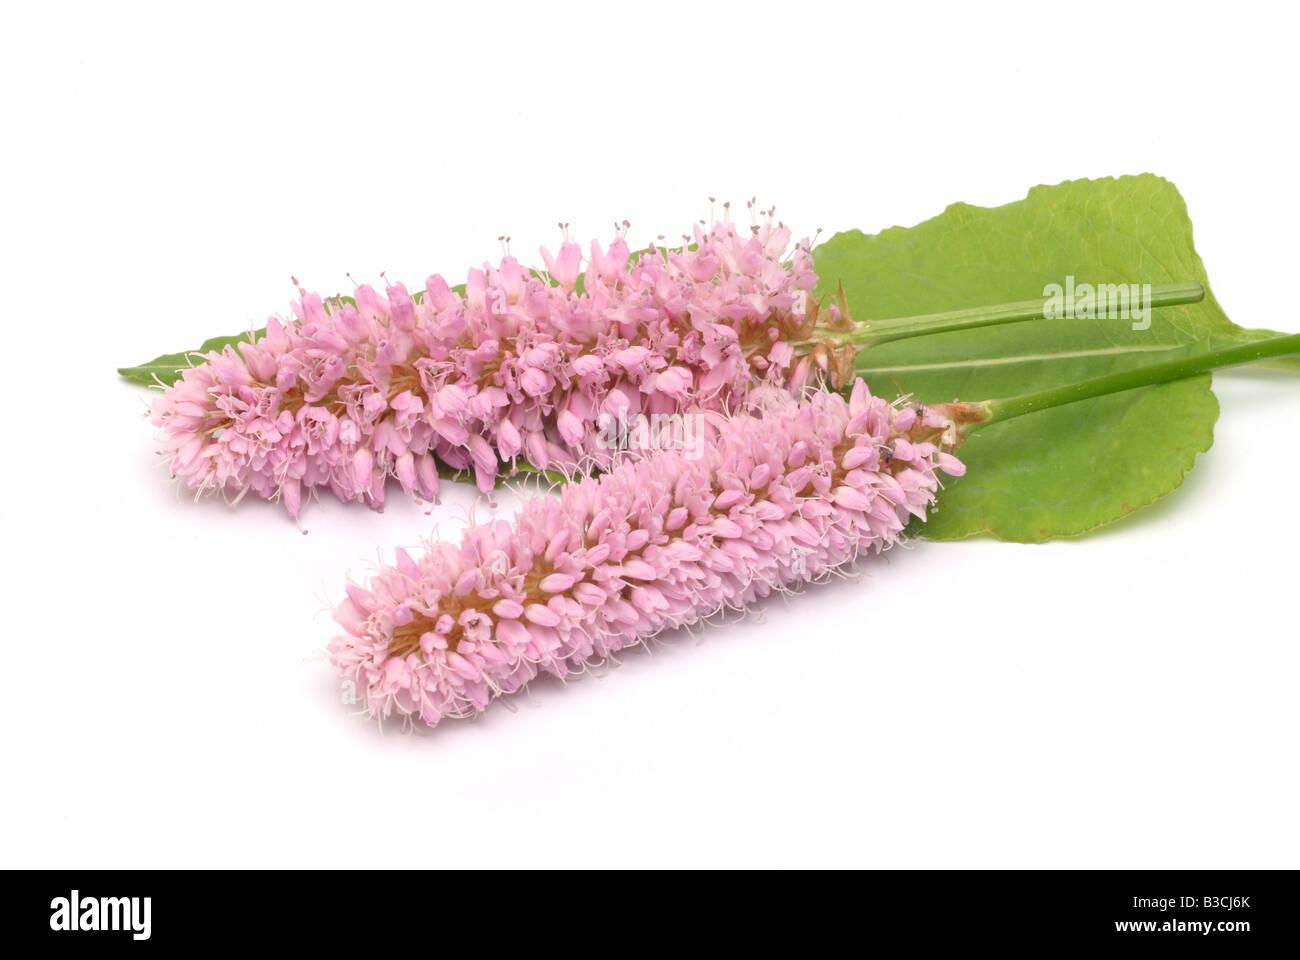 medicinal plant Bistrot bistort snake root Polygonum bistorta Bostoria - Stock Image